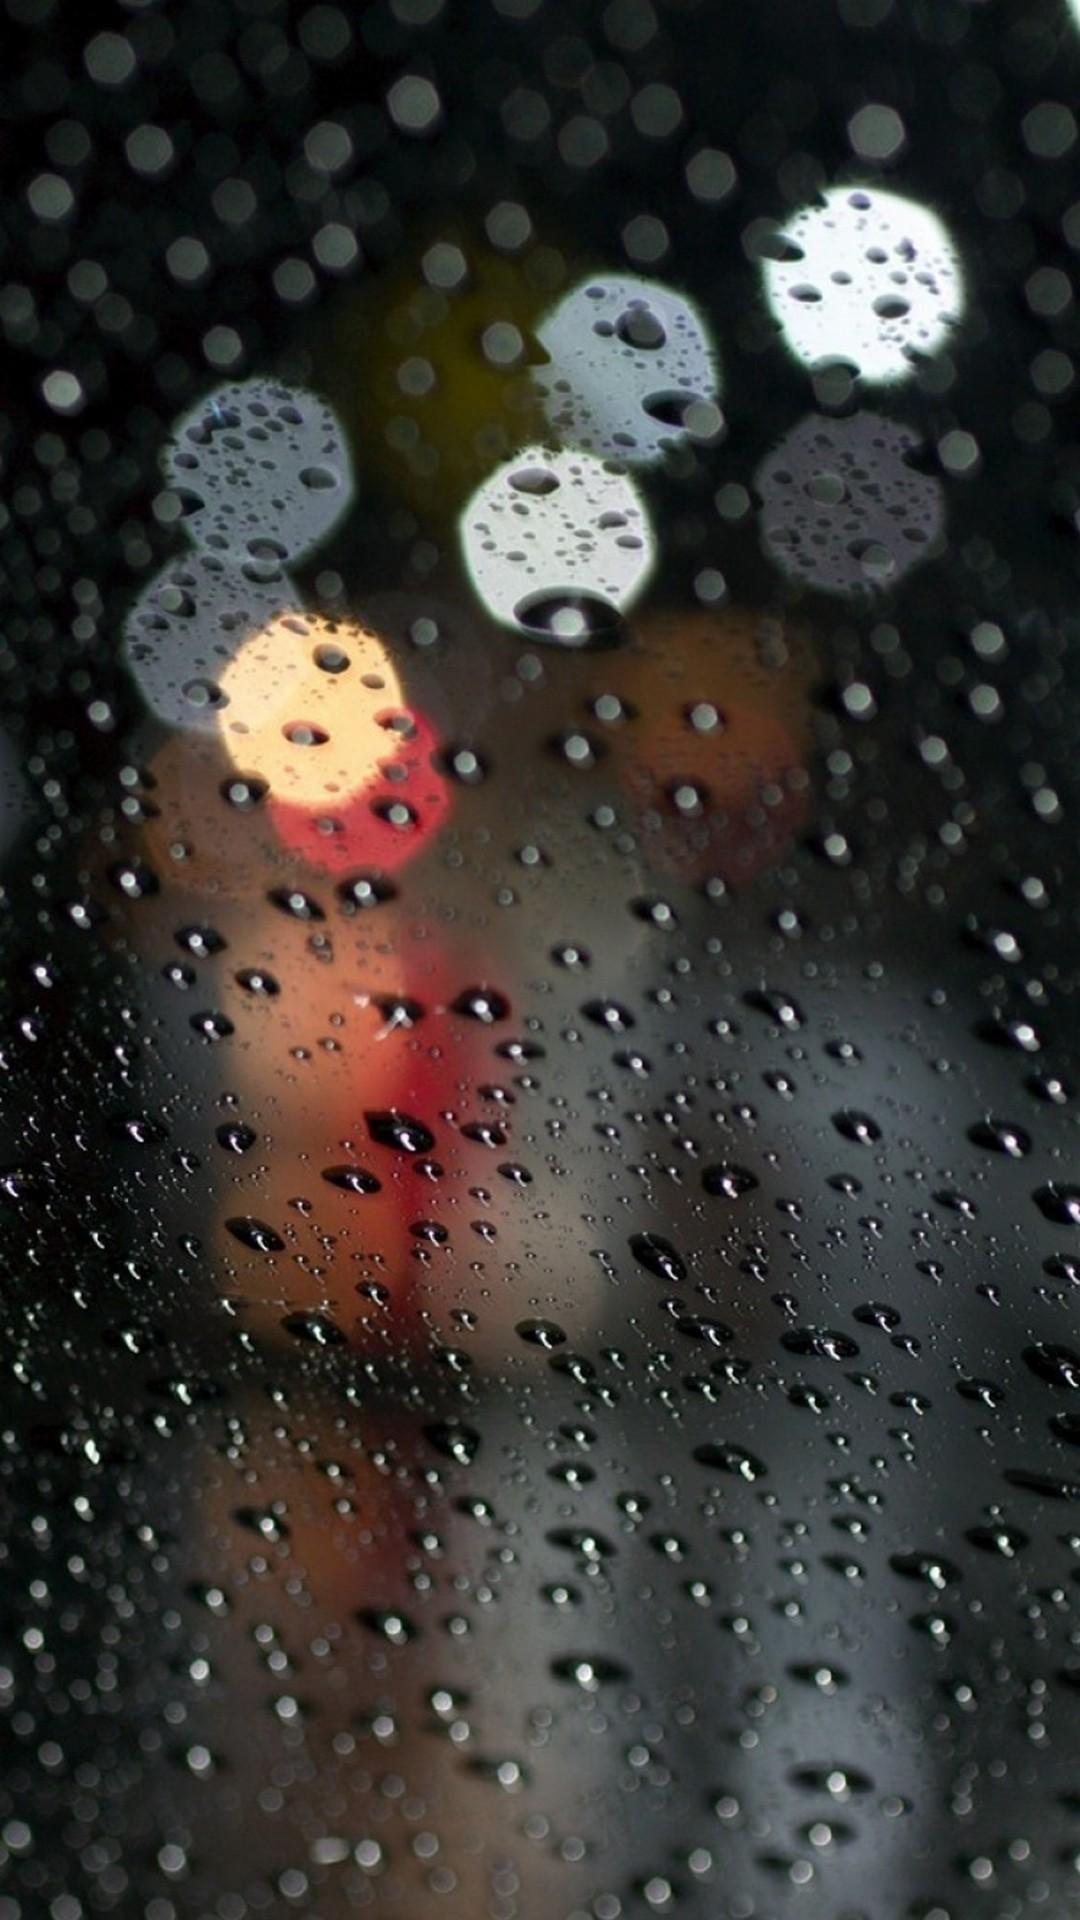 Raindrop Iphone 6 Wallpaper Resolution Rain Drops